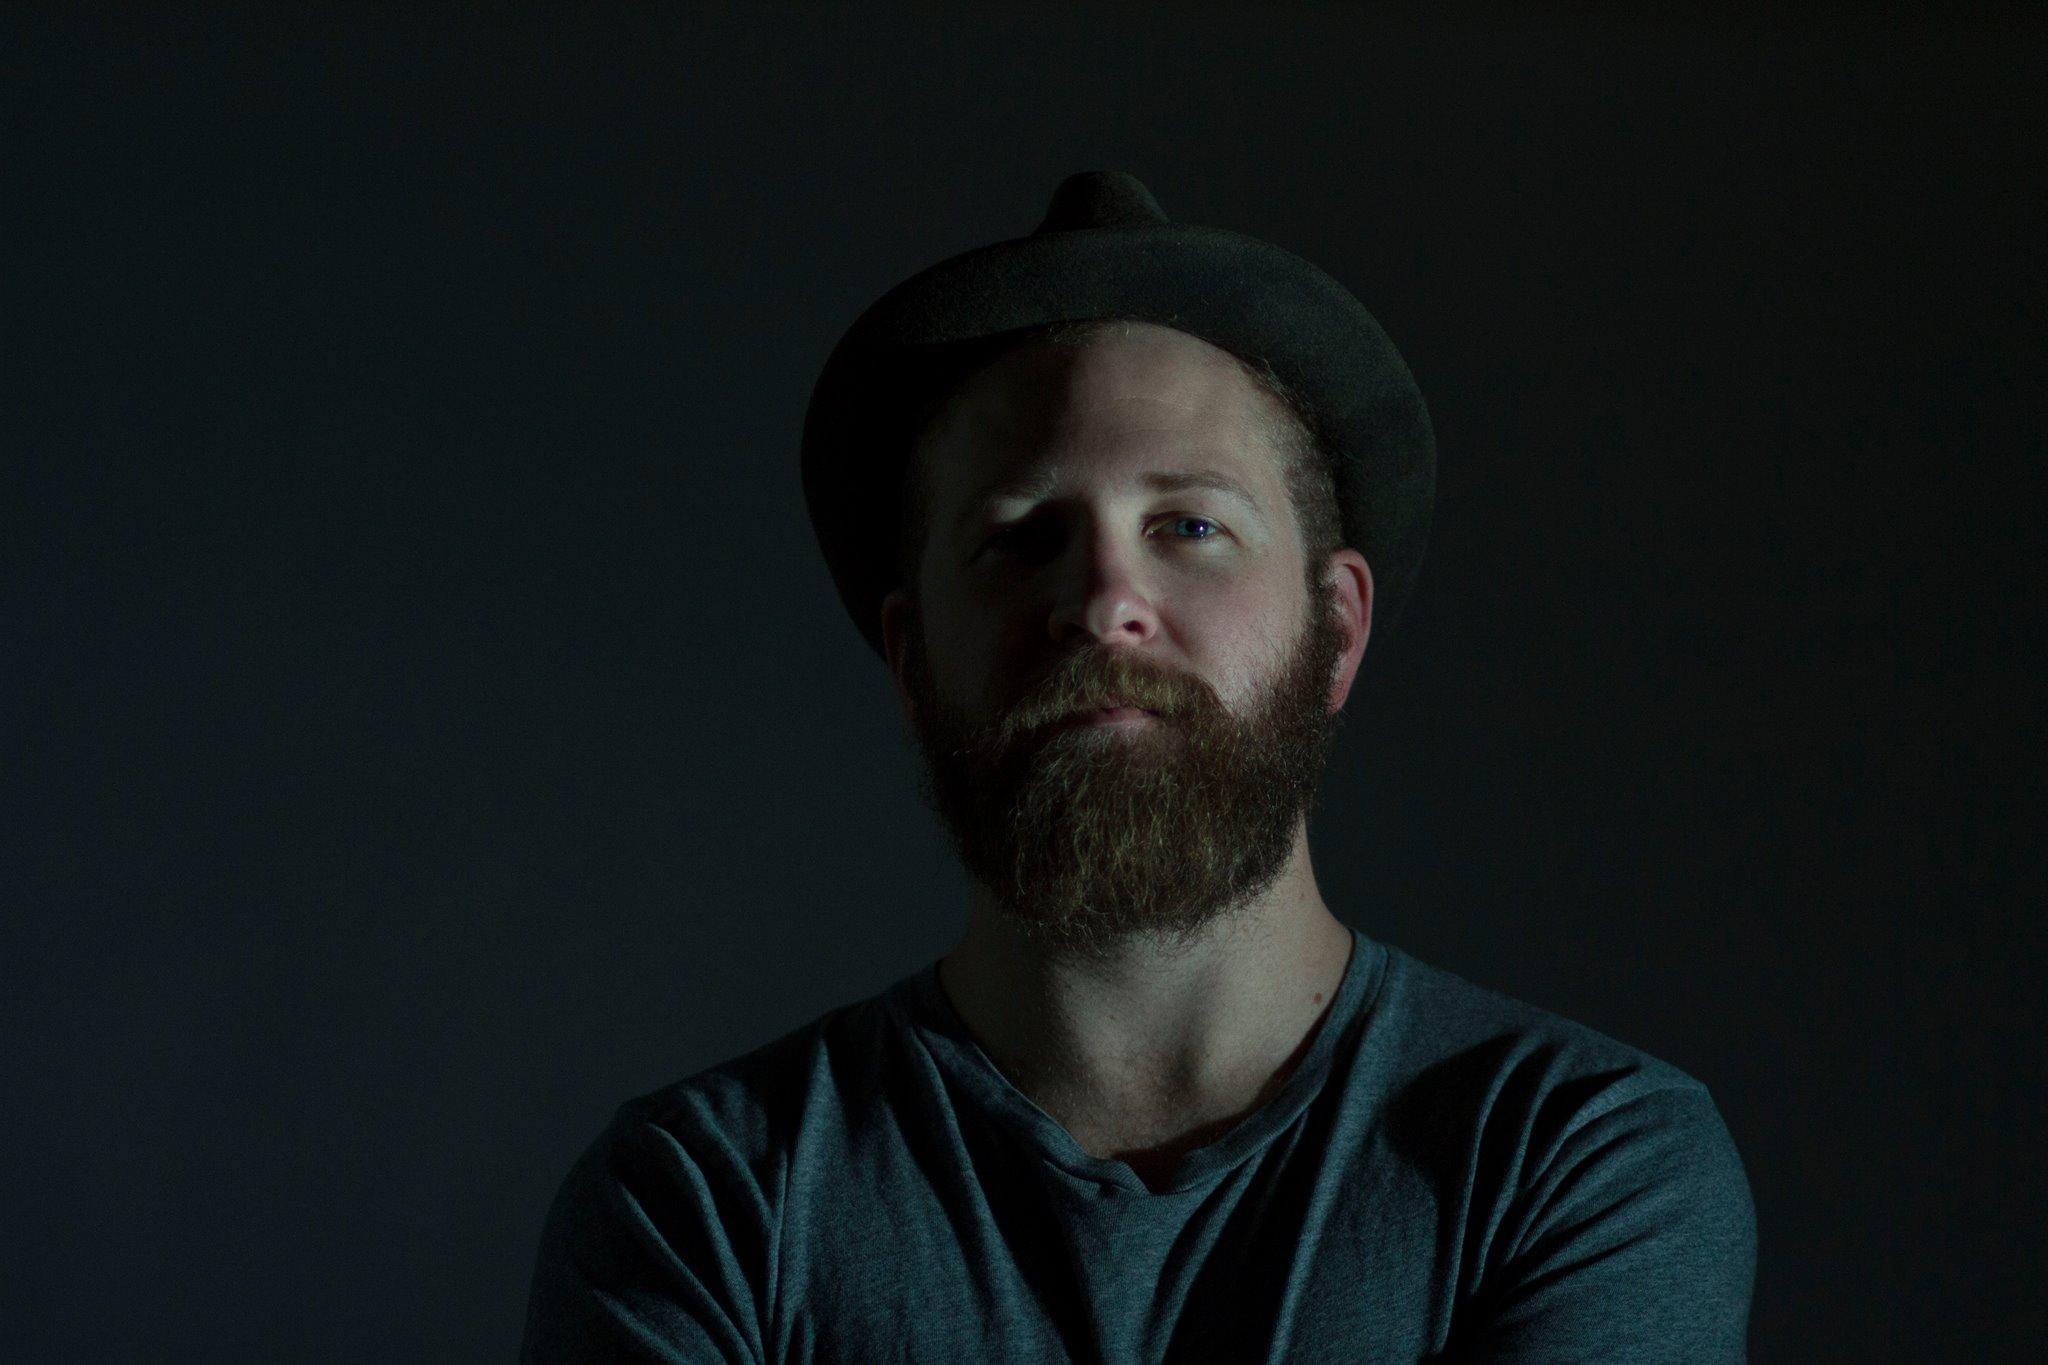 Cody Marlowe — June 3, 2016 — Red Light Café, Atlanta, GA